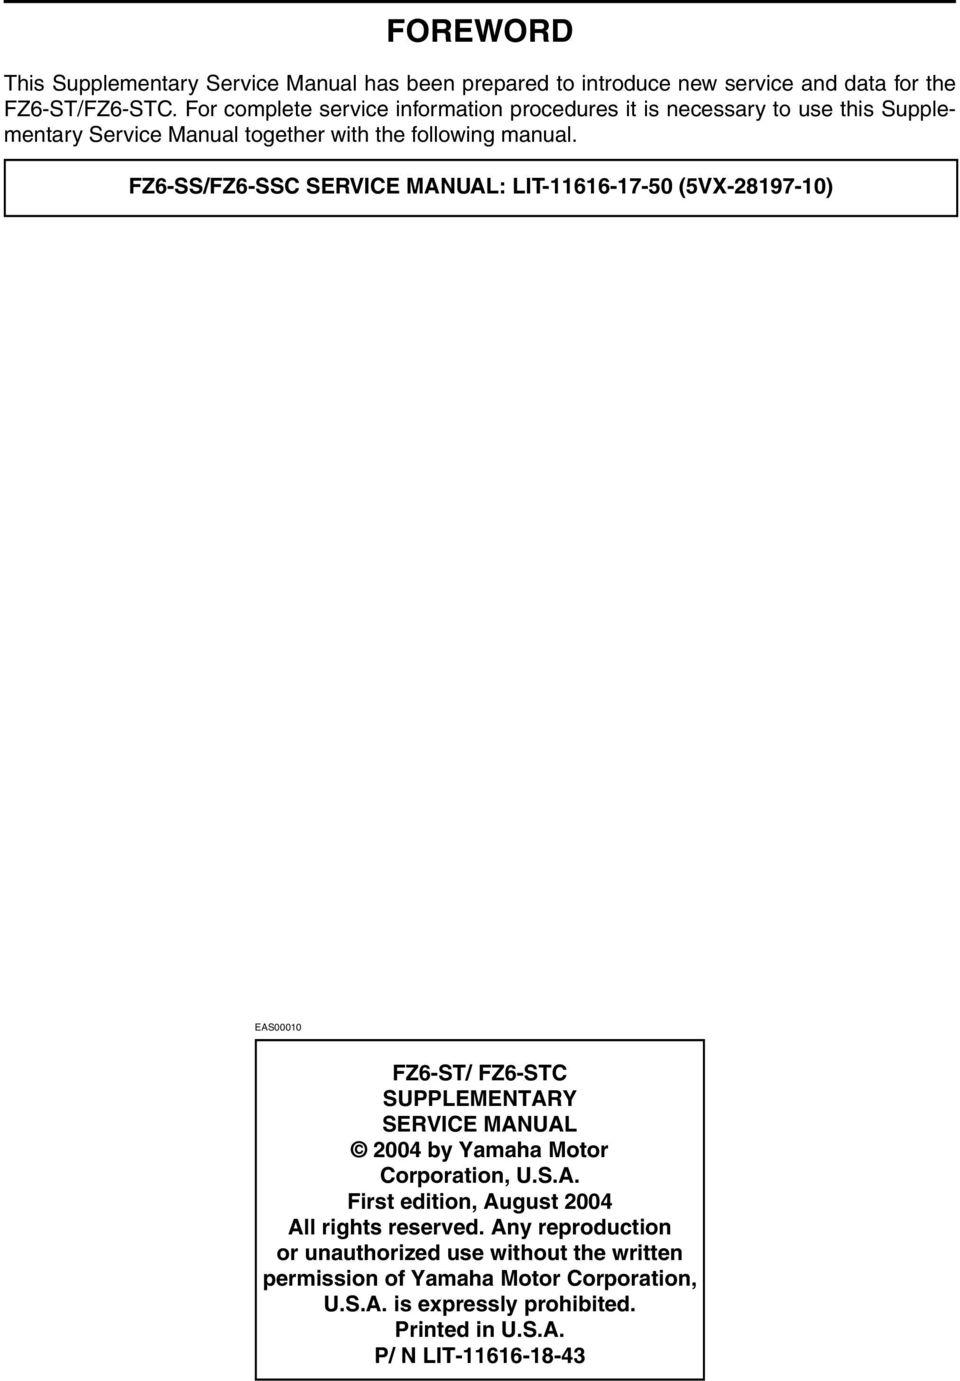 hight resolution of fz6 ss fz6 ssc service manual lit 66 7